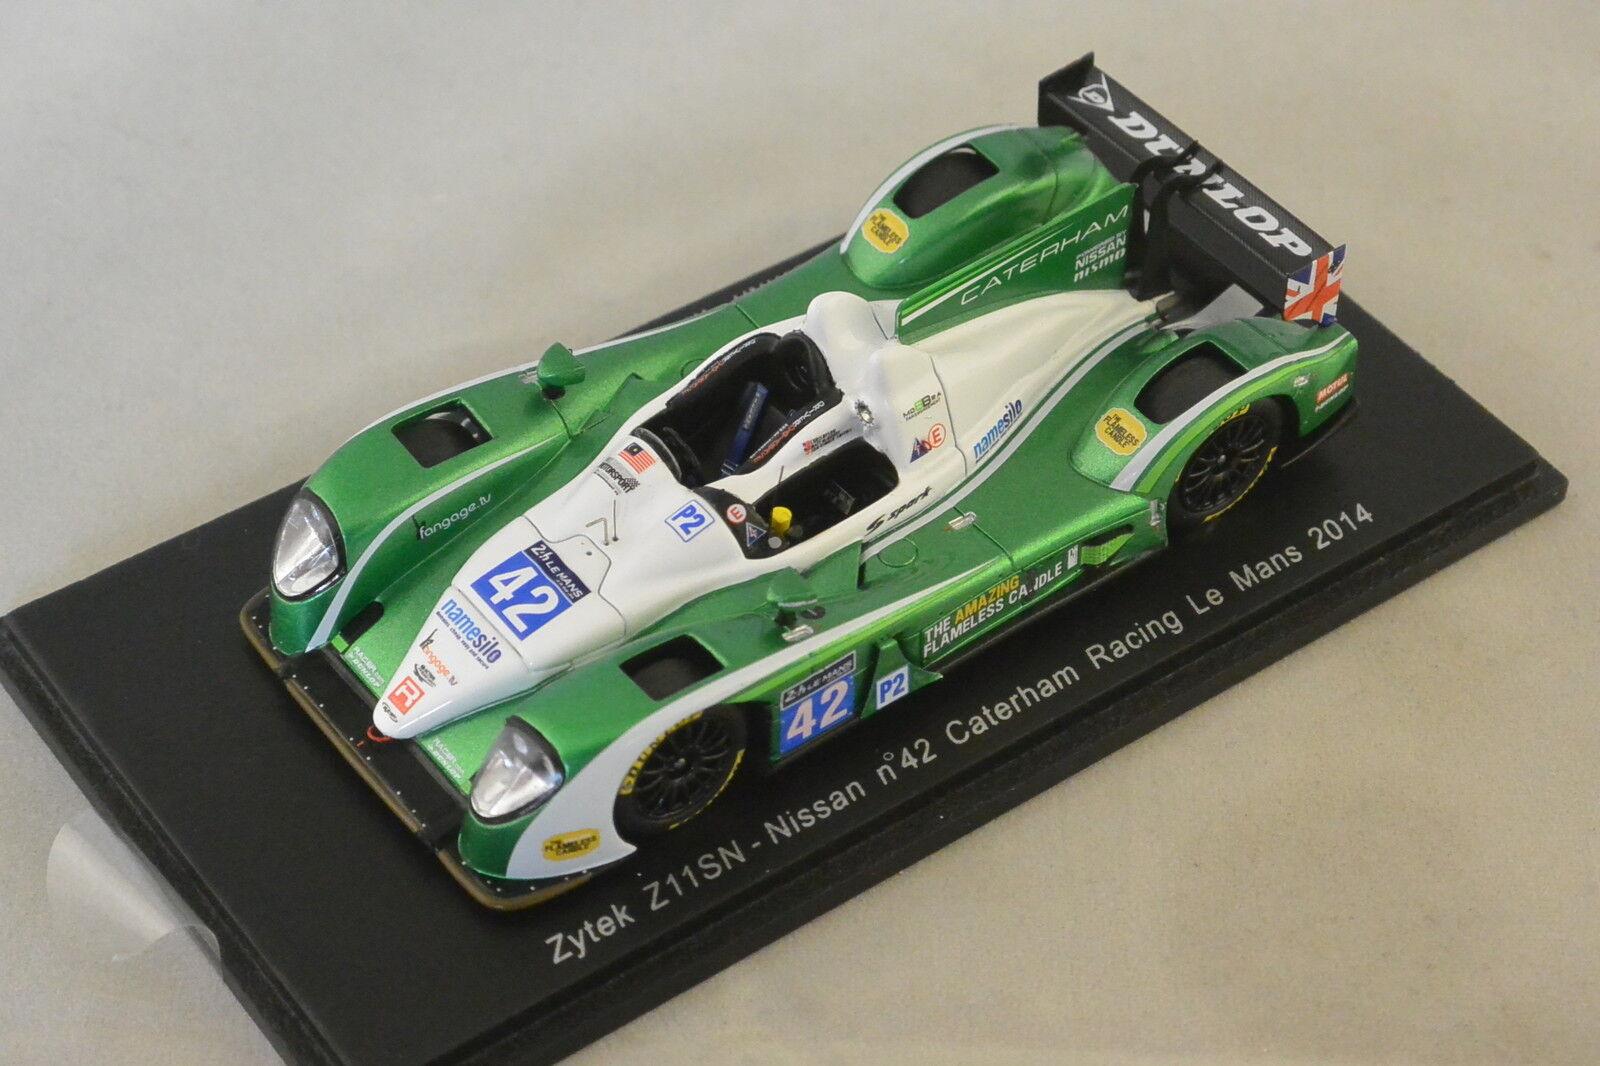 Spark S4221 - ZYTEK Z11SN Nissan Caterham Racing n°42 25ème Le Mans 2014   1 43